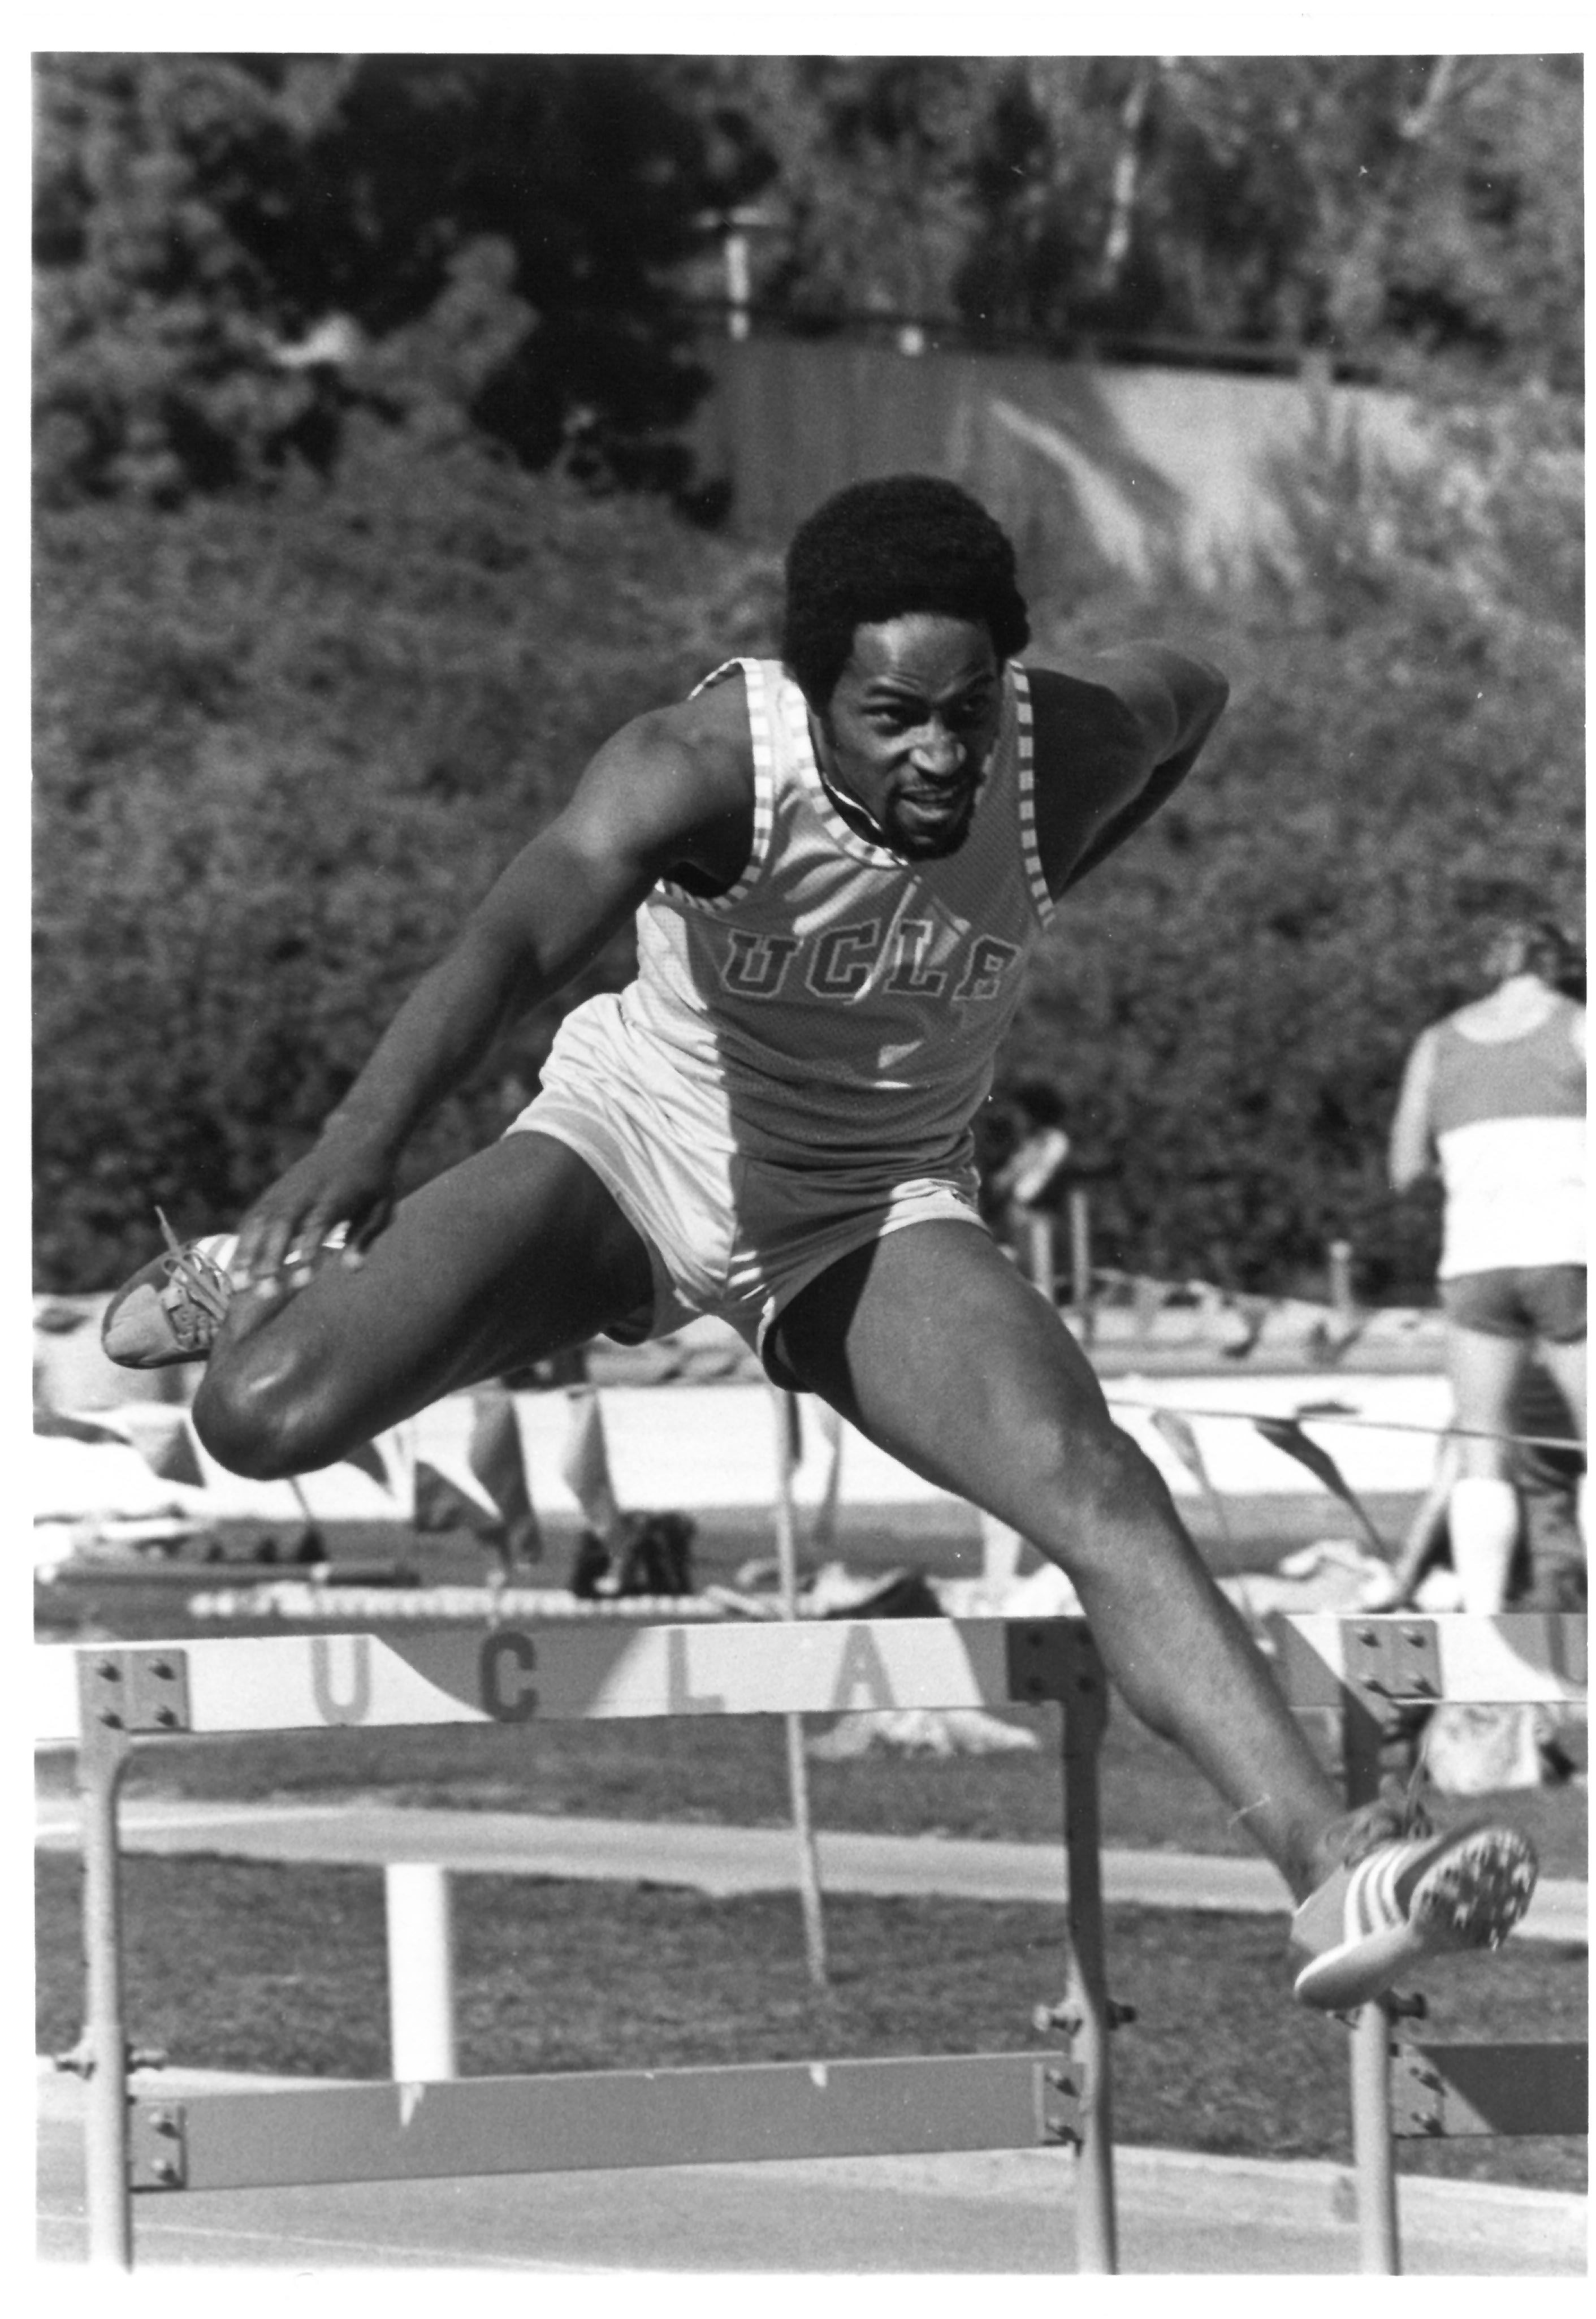 Phillips running 400m Hurdles at UCLA